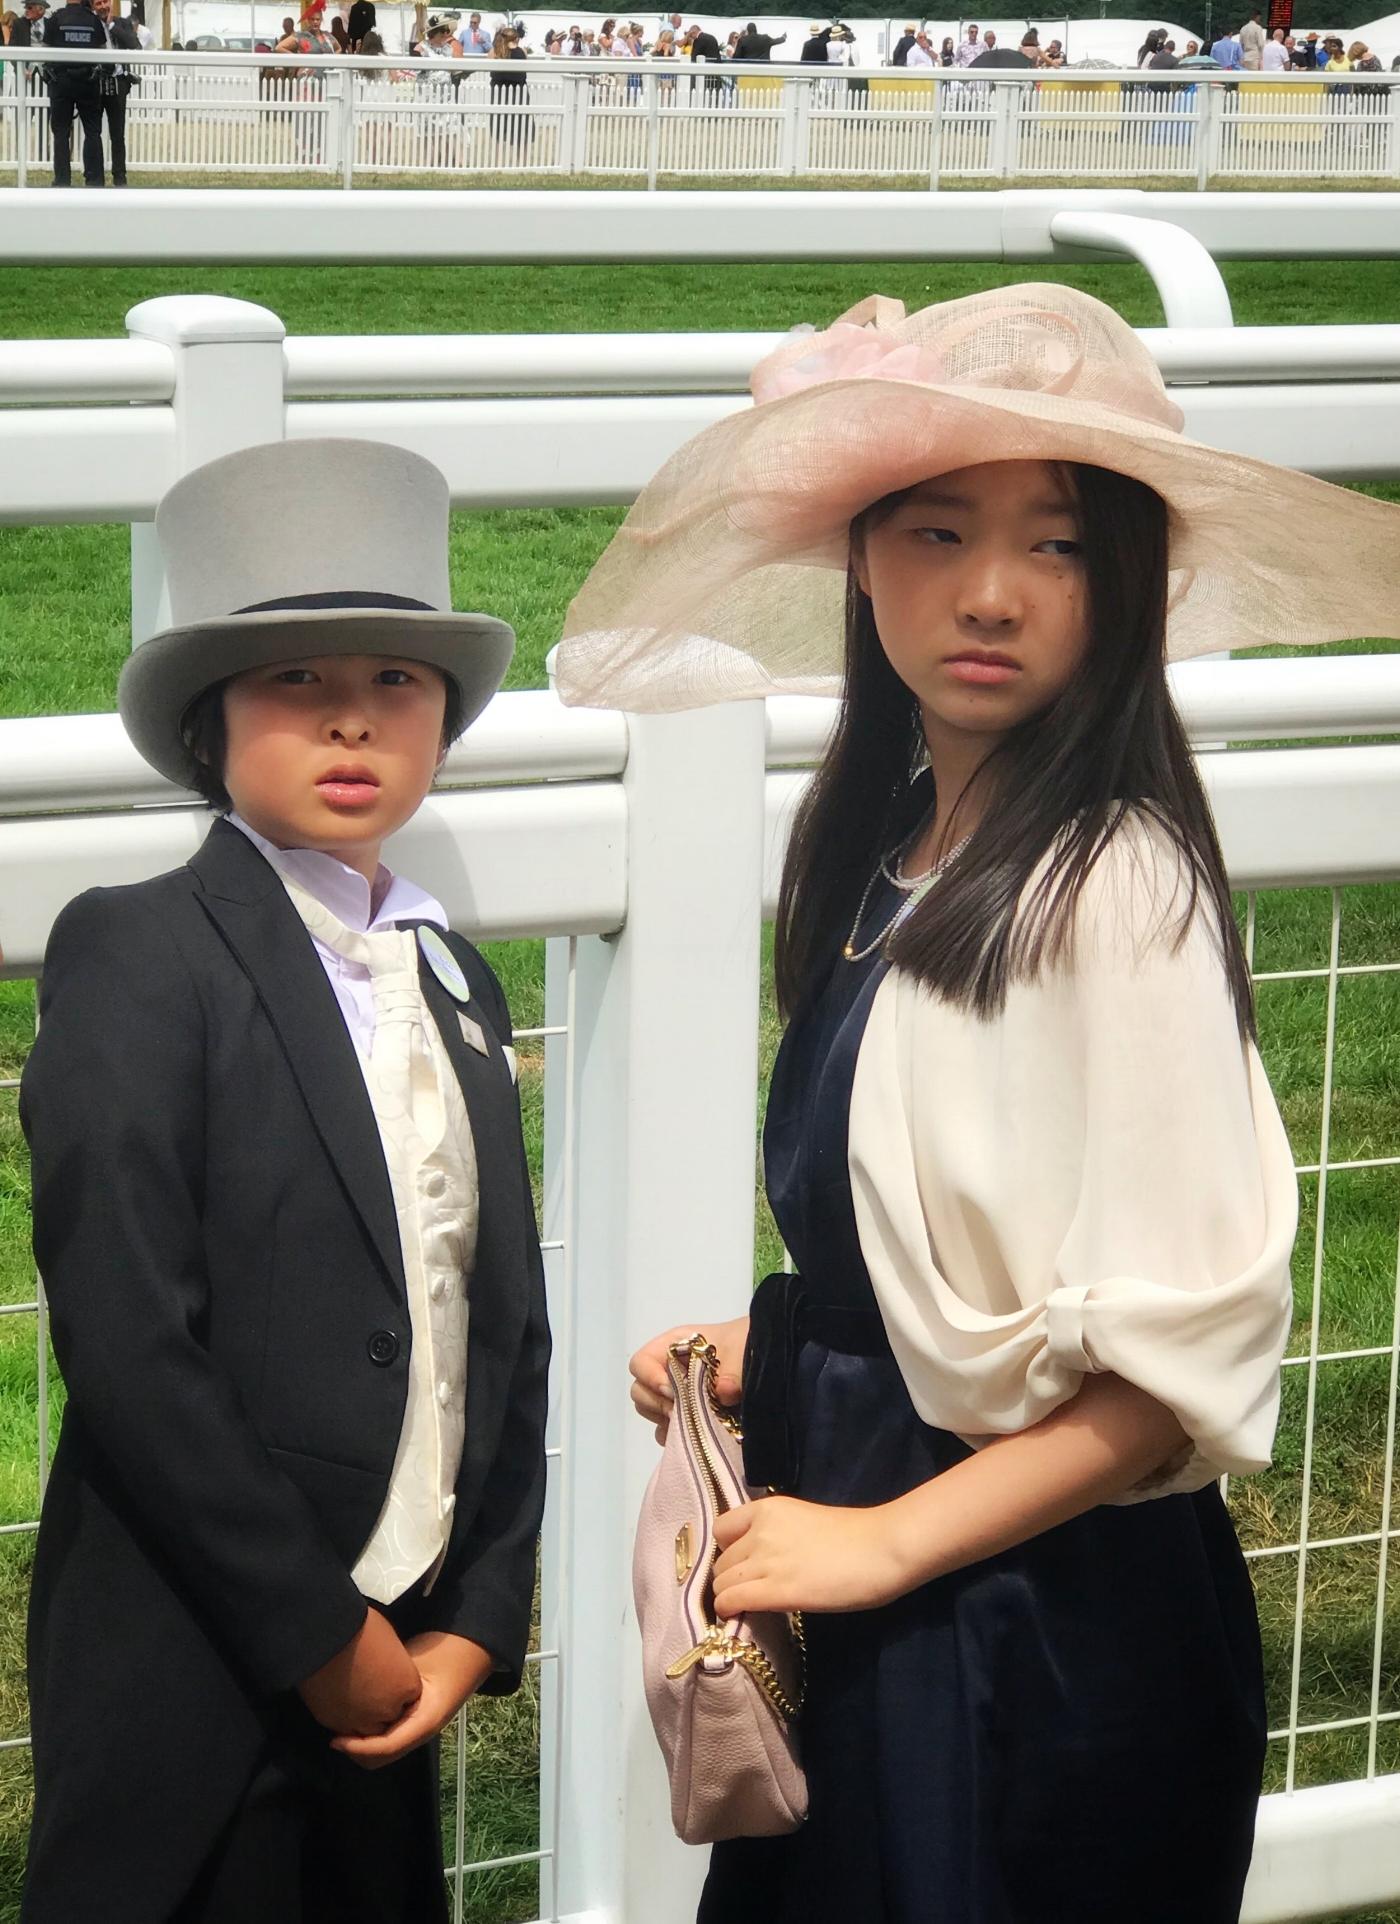 The children of Ascot